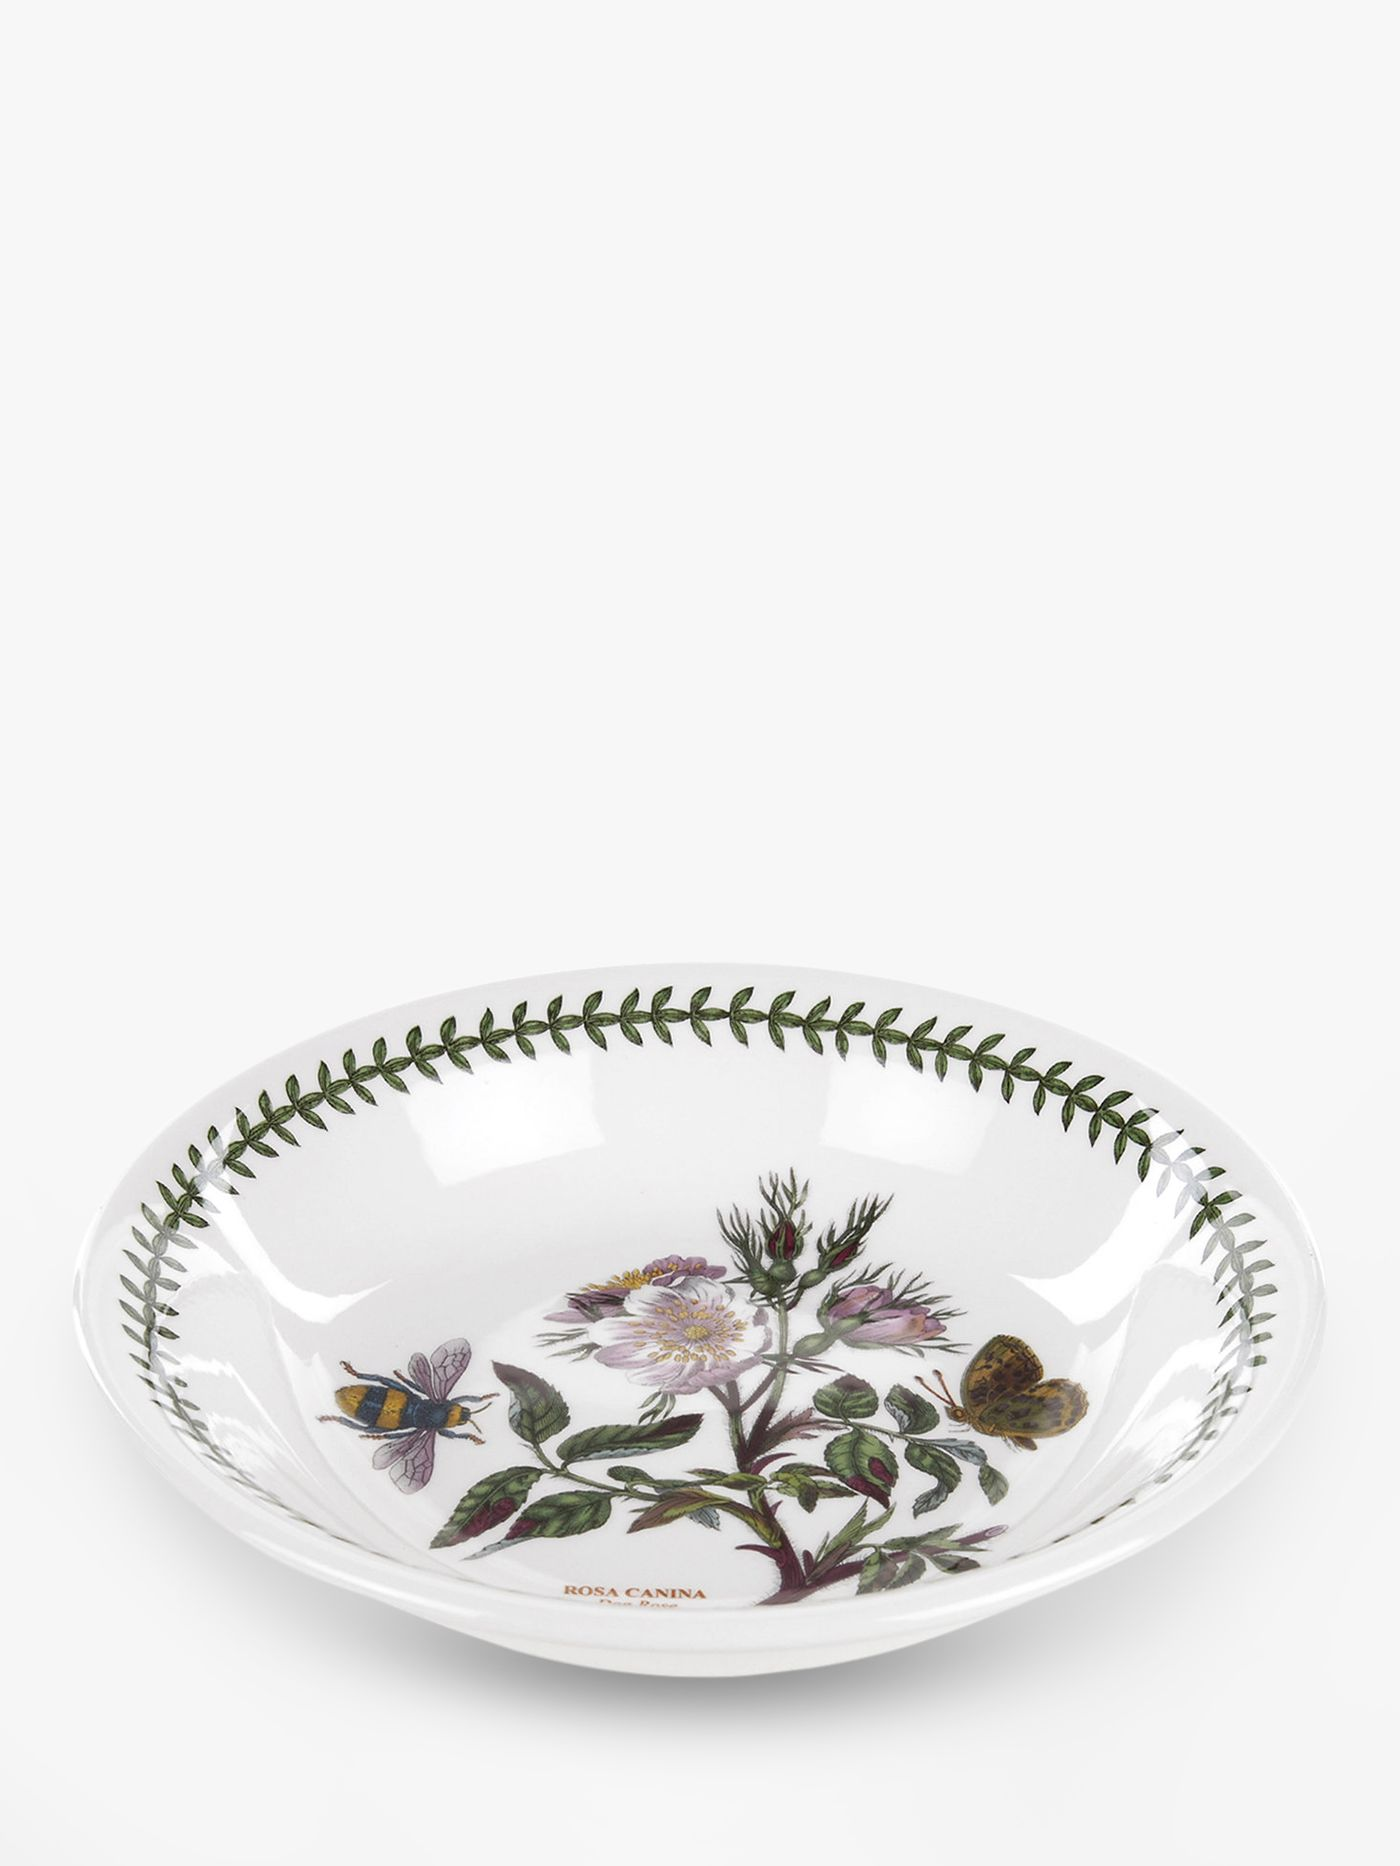 Portmeirion Botanic Garden Dog Rose Flower Pasta Bowl, 20cm, Seconds